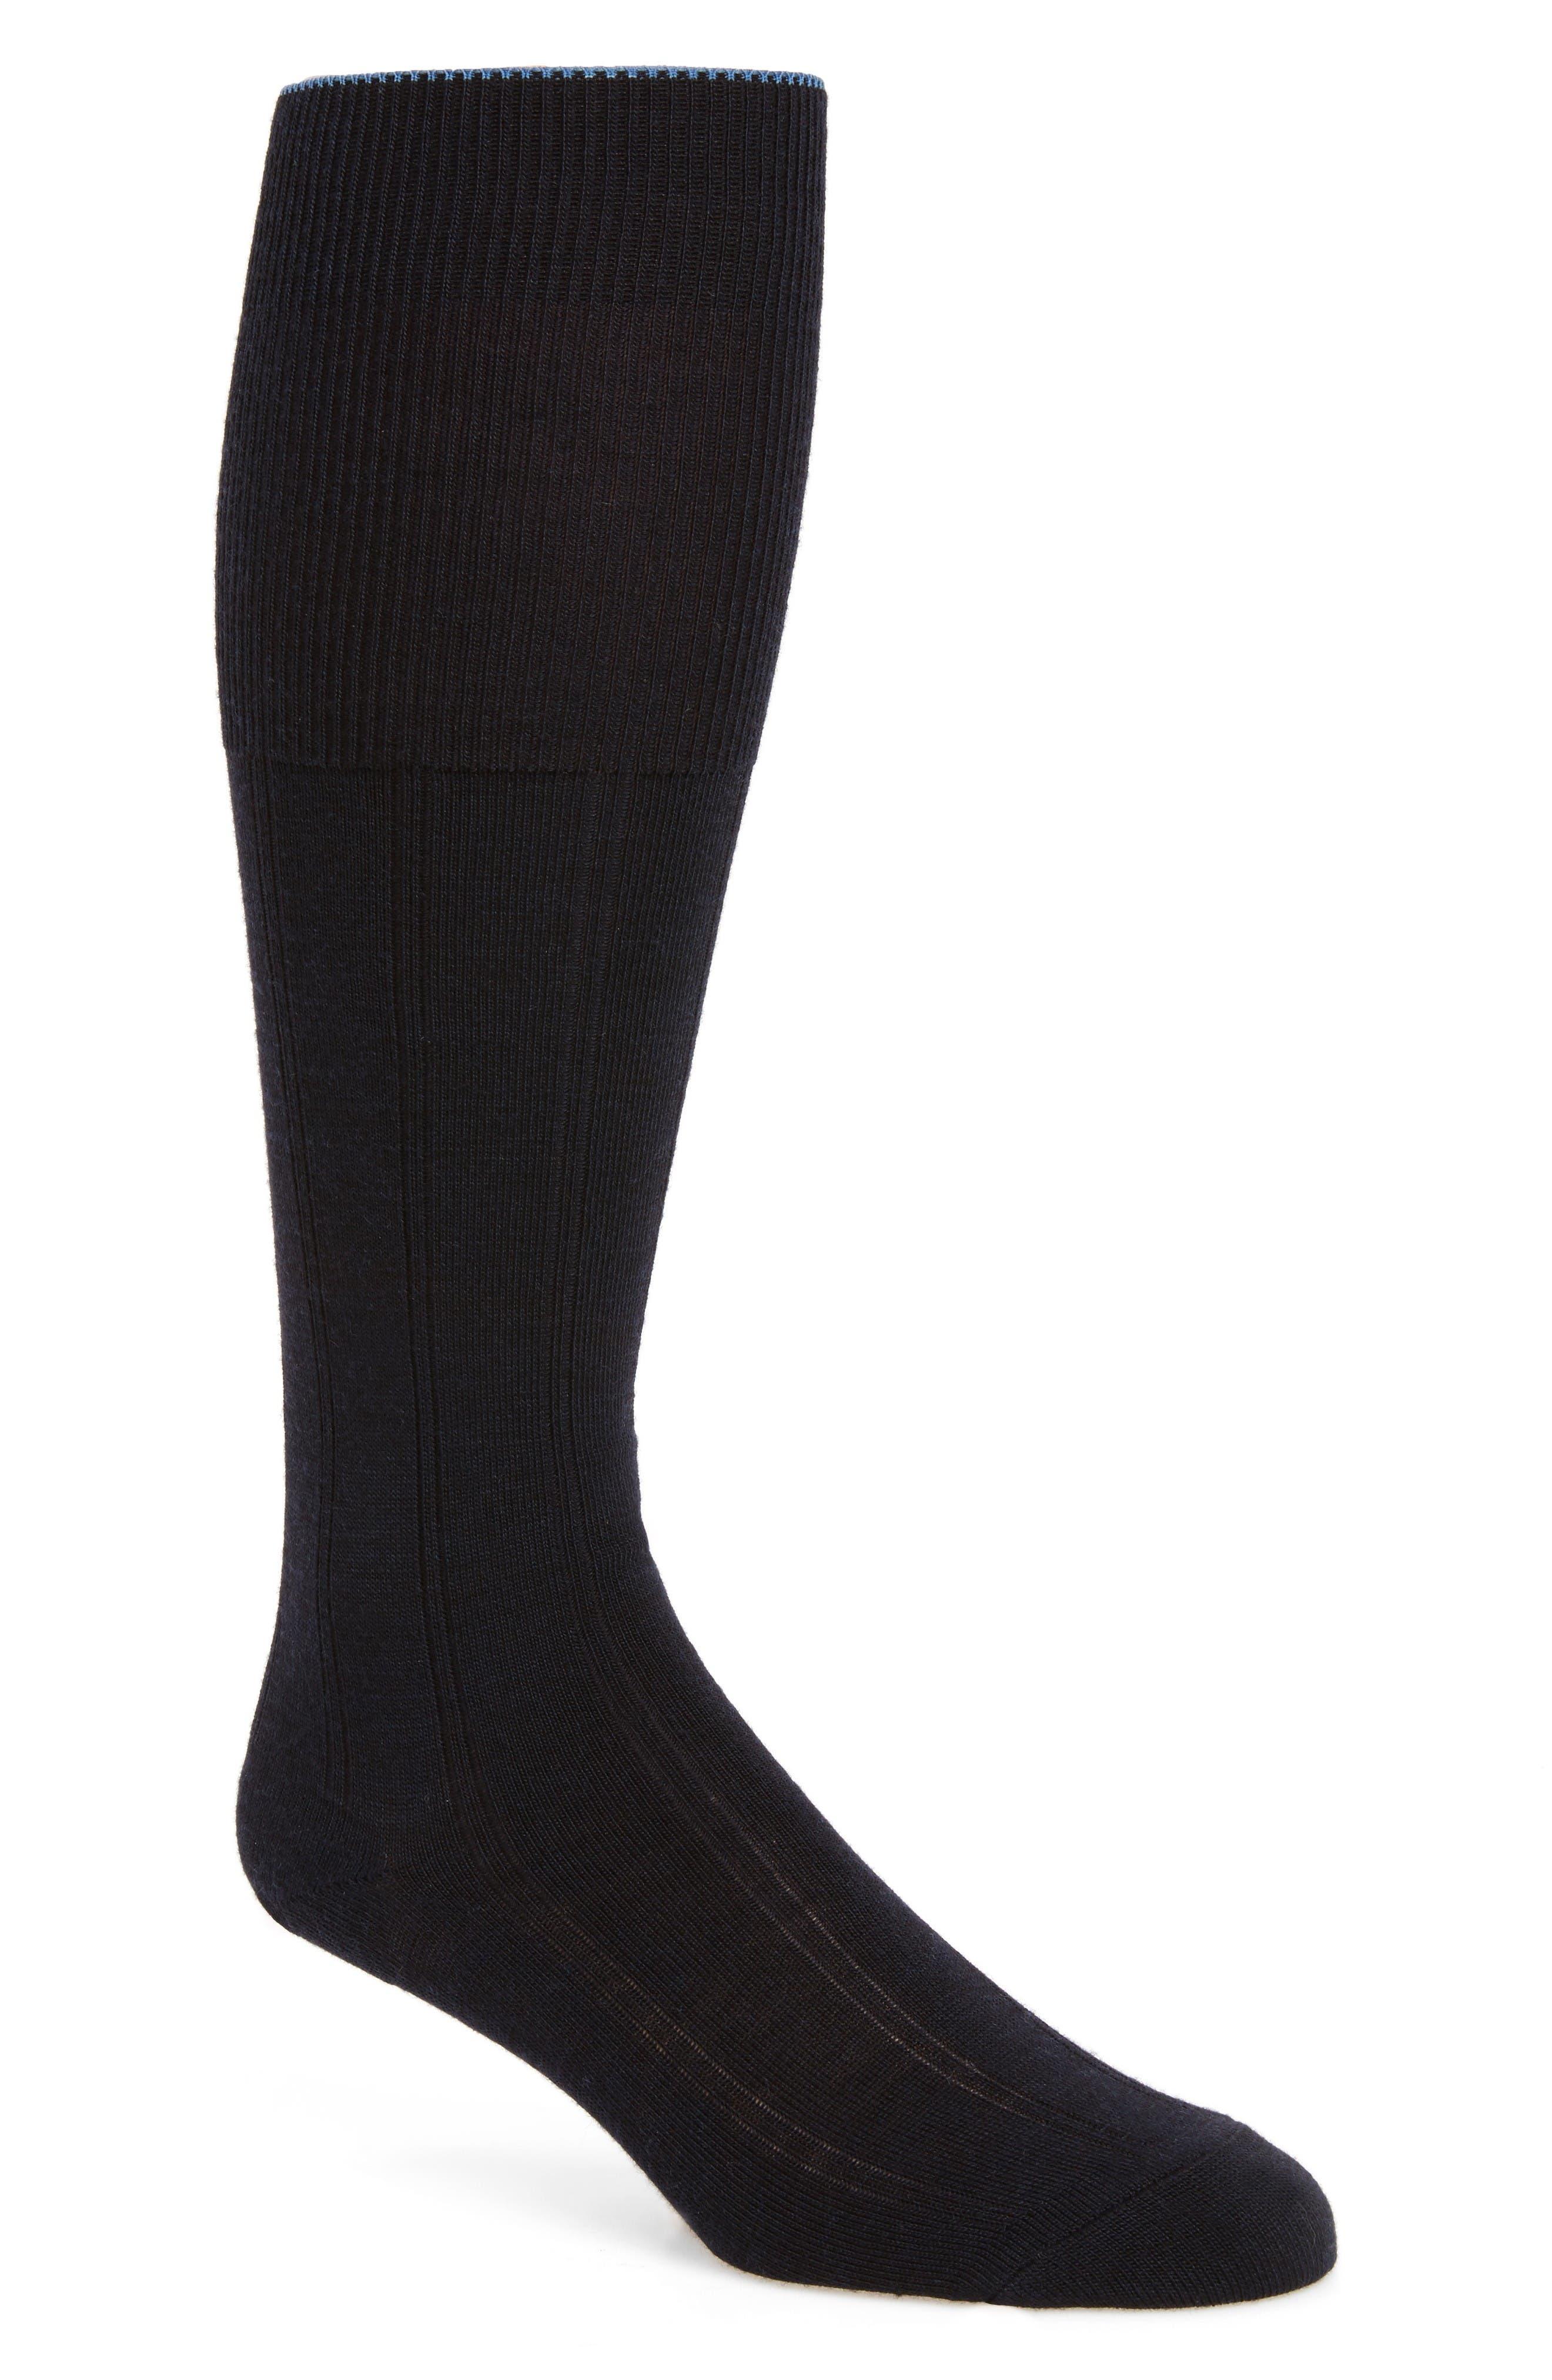 Nordstrom Men's Shop Over the Calf Wool Socks (3 for $35)